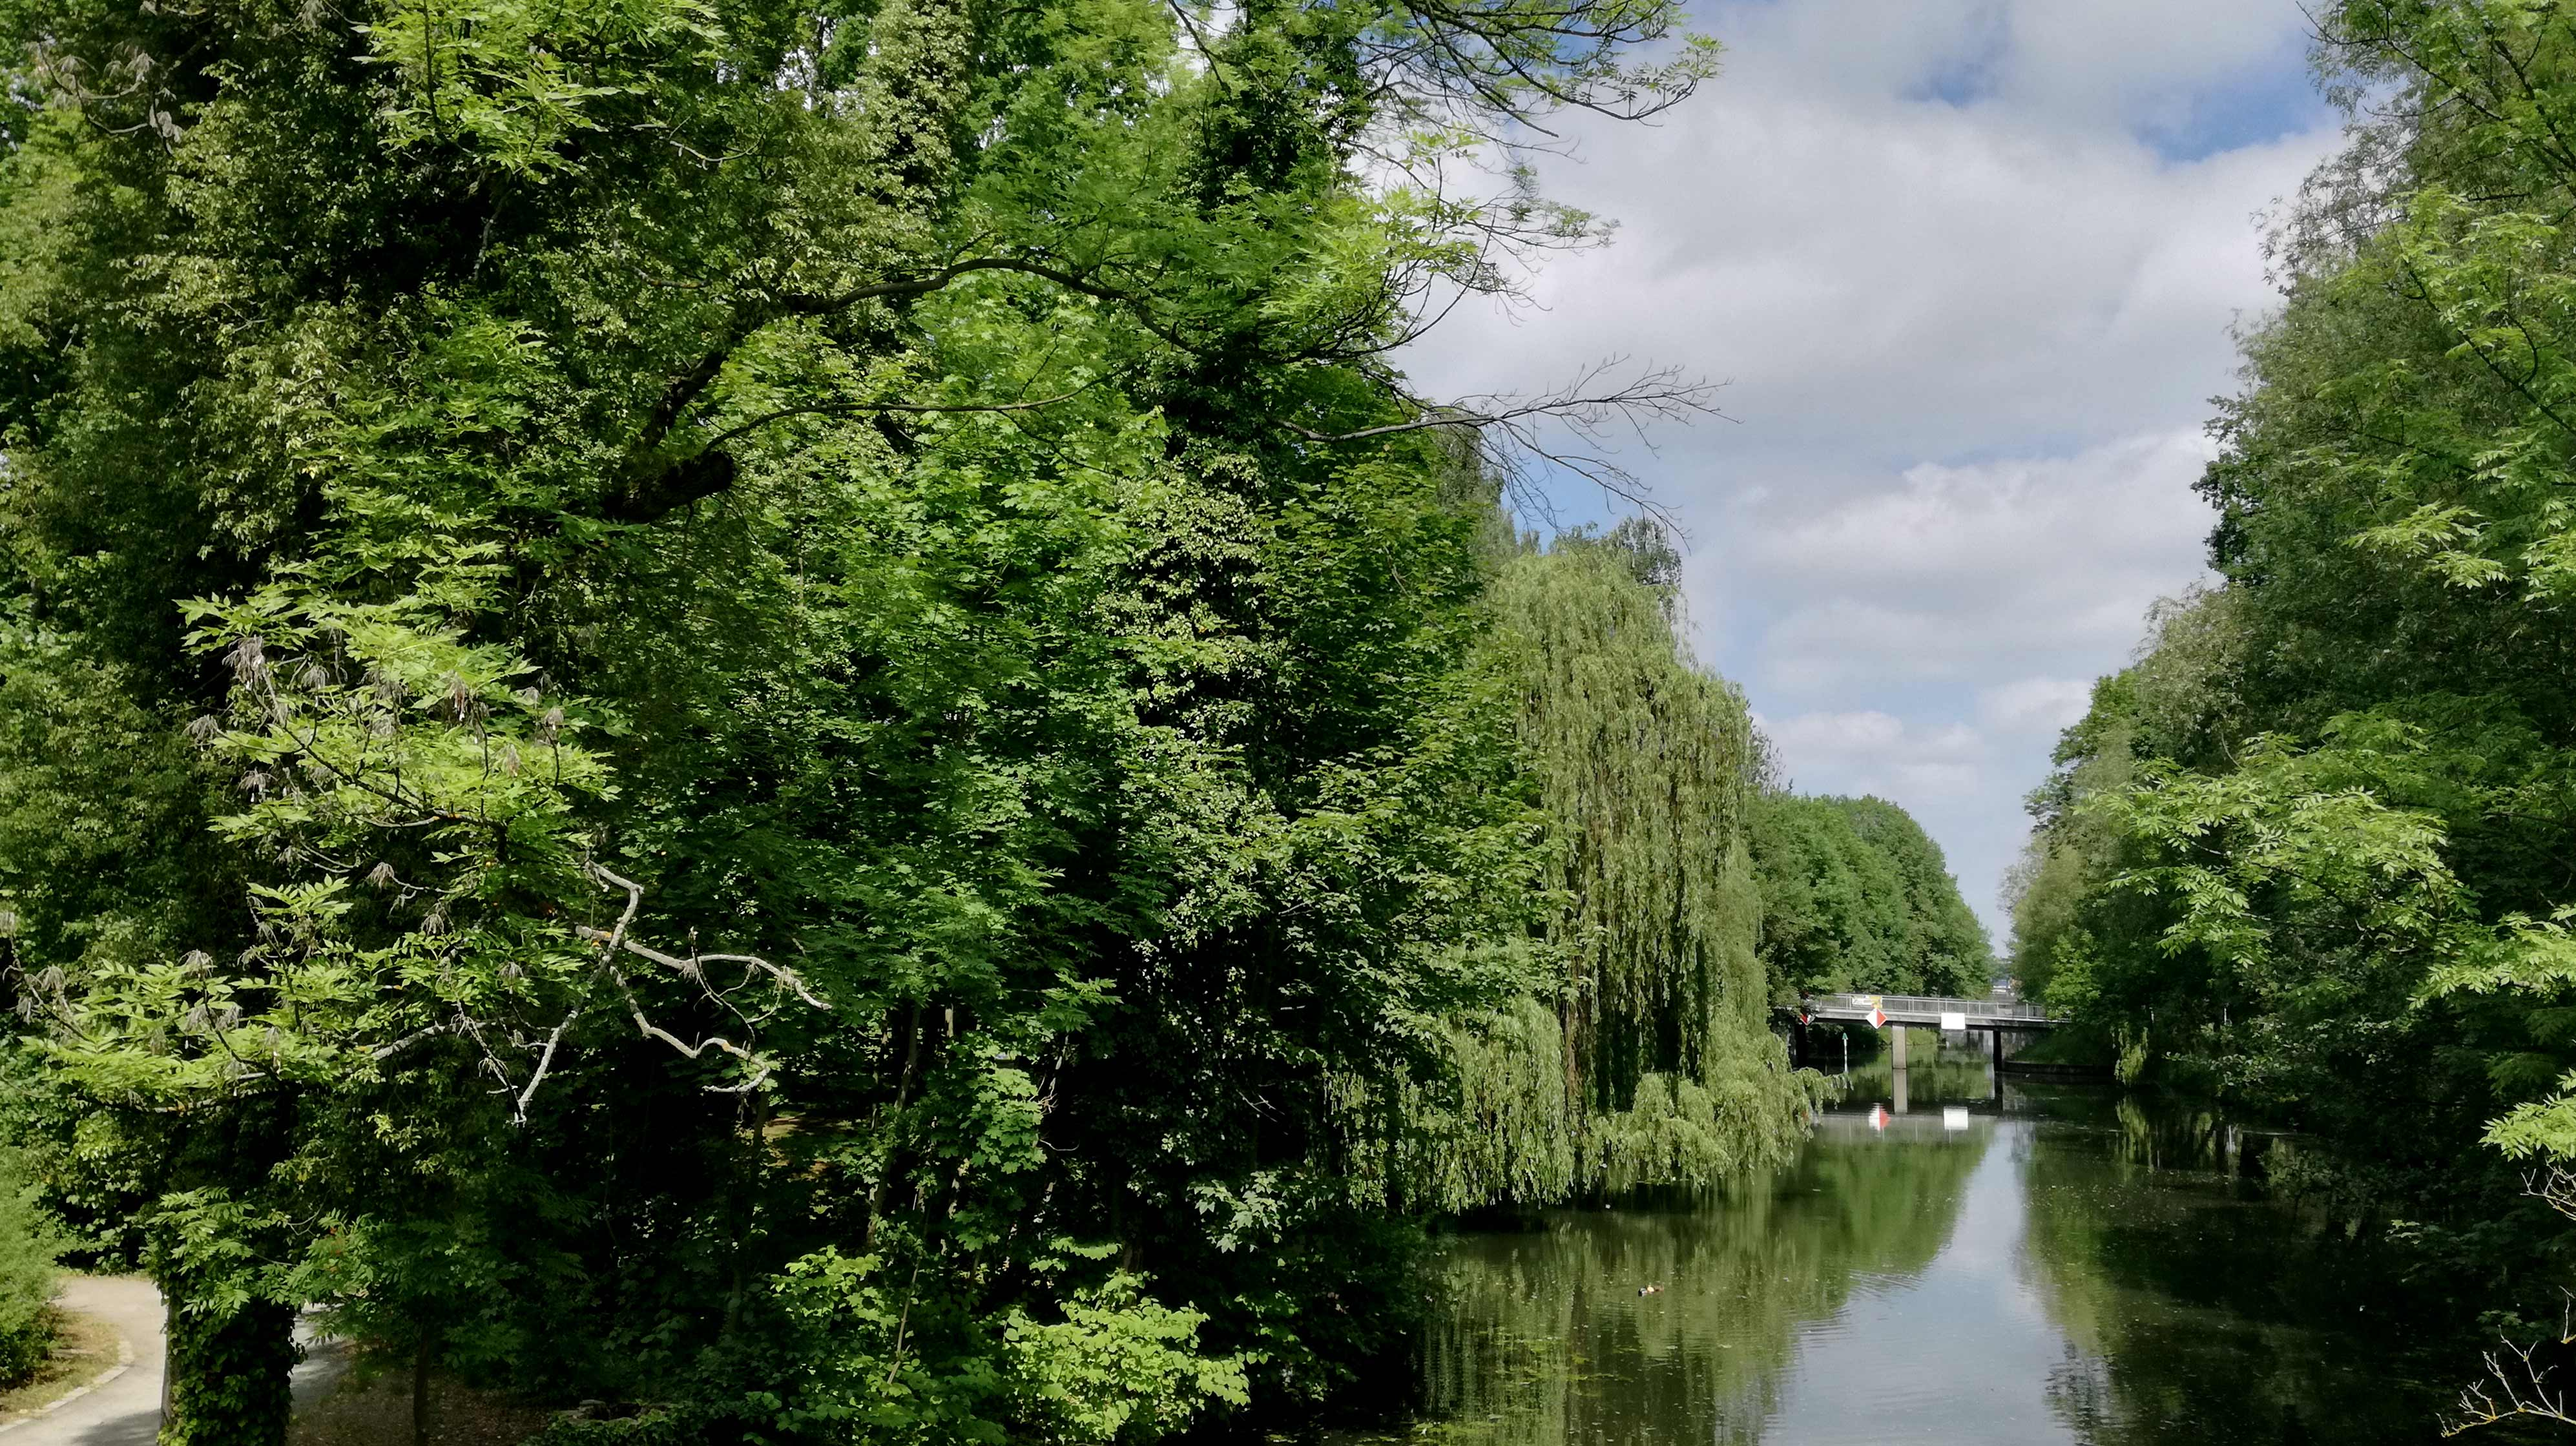 Blick gen Berlin: Nottekanal Richtung Hafen Niederlehme |Johannes Ulrich Gehrke | Blog